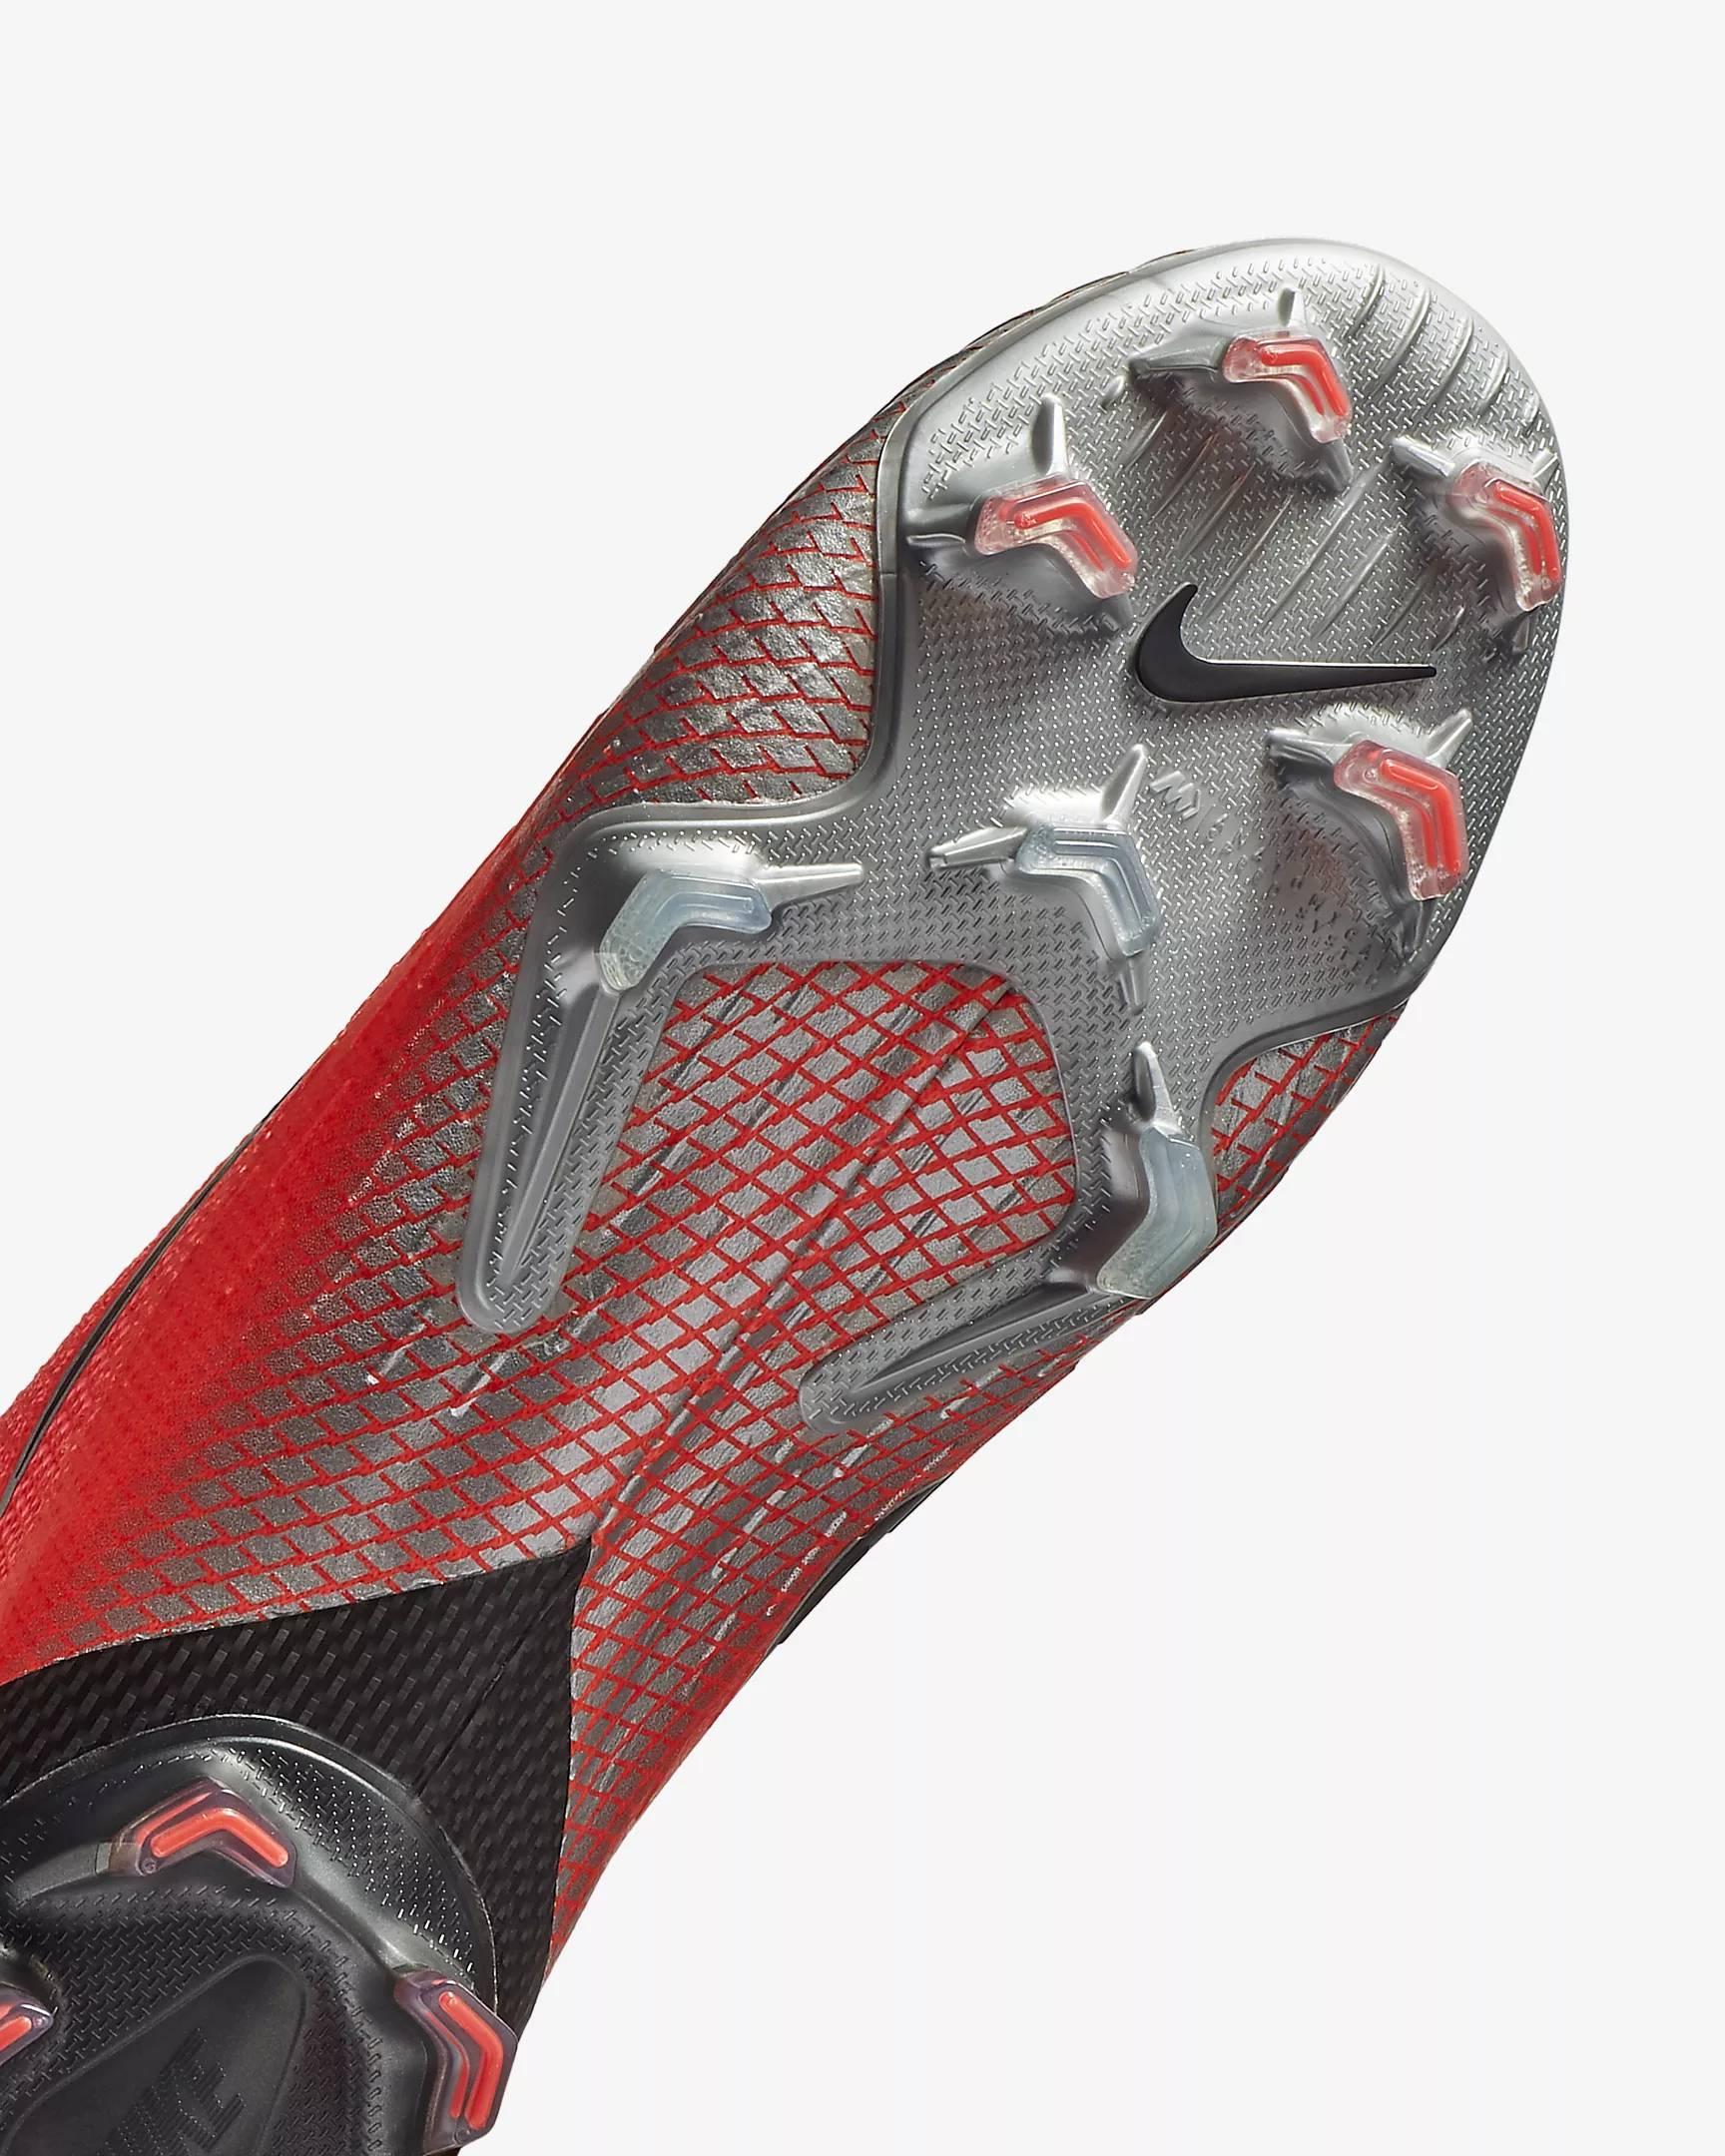 ... Click to enlarge image  nike mercurial superfly 360 elite cr7 fg flash crimson total crimson black g.jpg 2b9df5c01